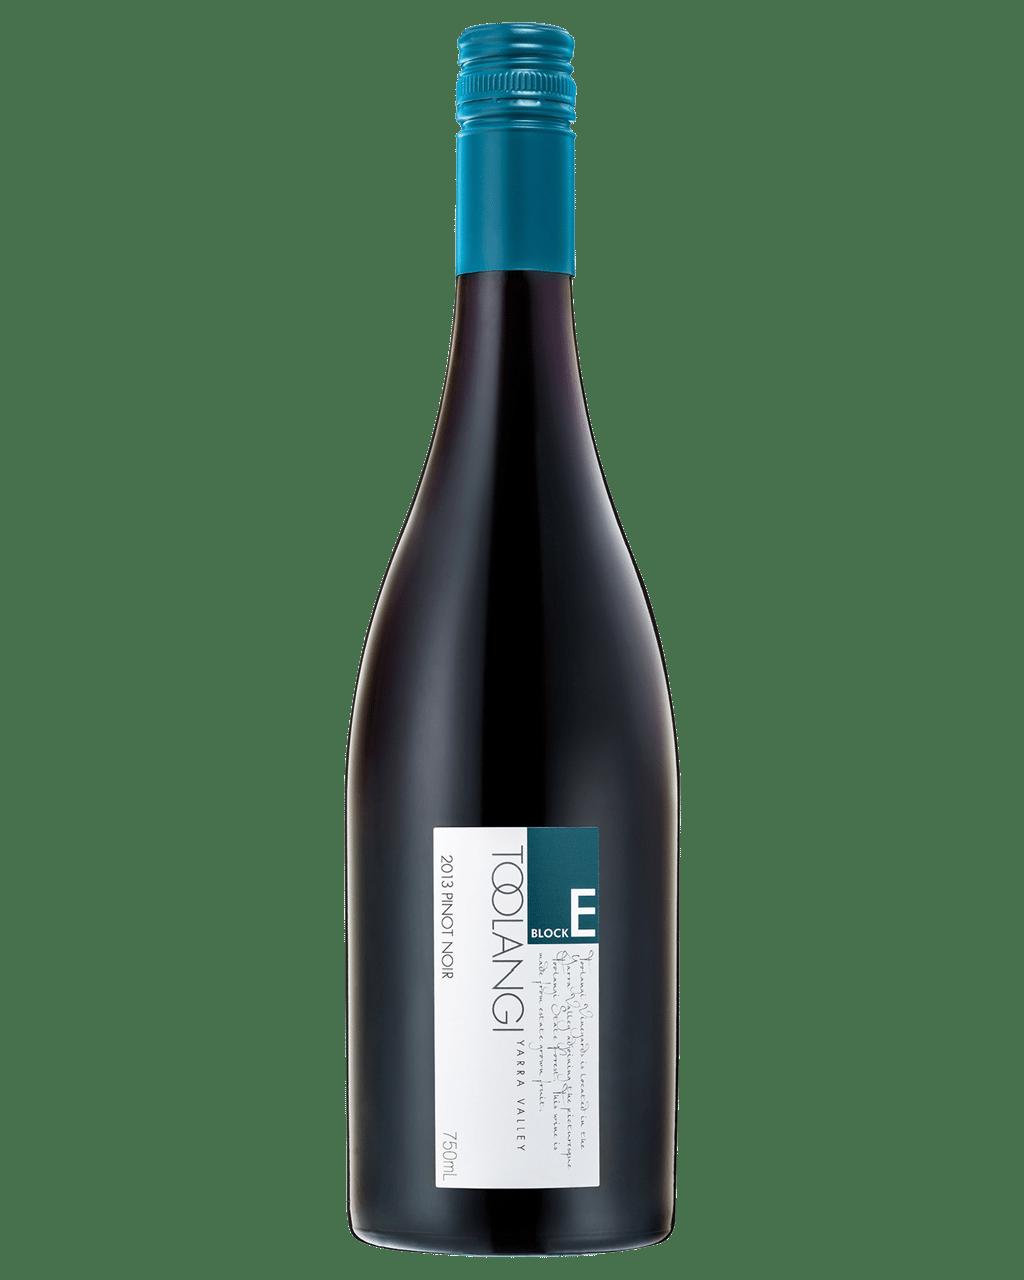 26e00f882e Toolangi Block E Pinot Noir | Dan Murphy's | Buy Wine, Champagne ...